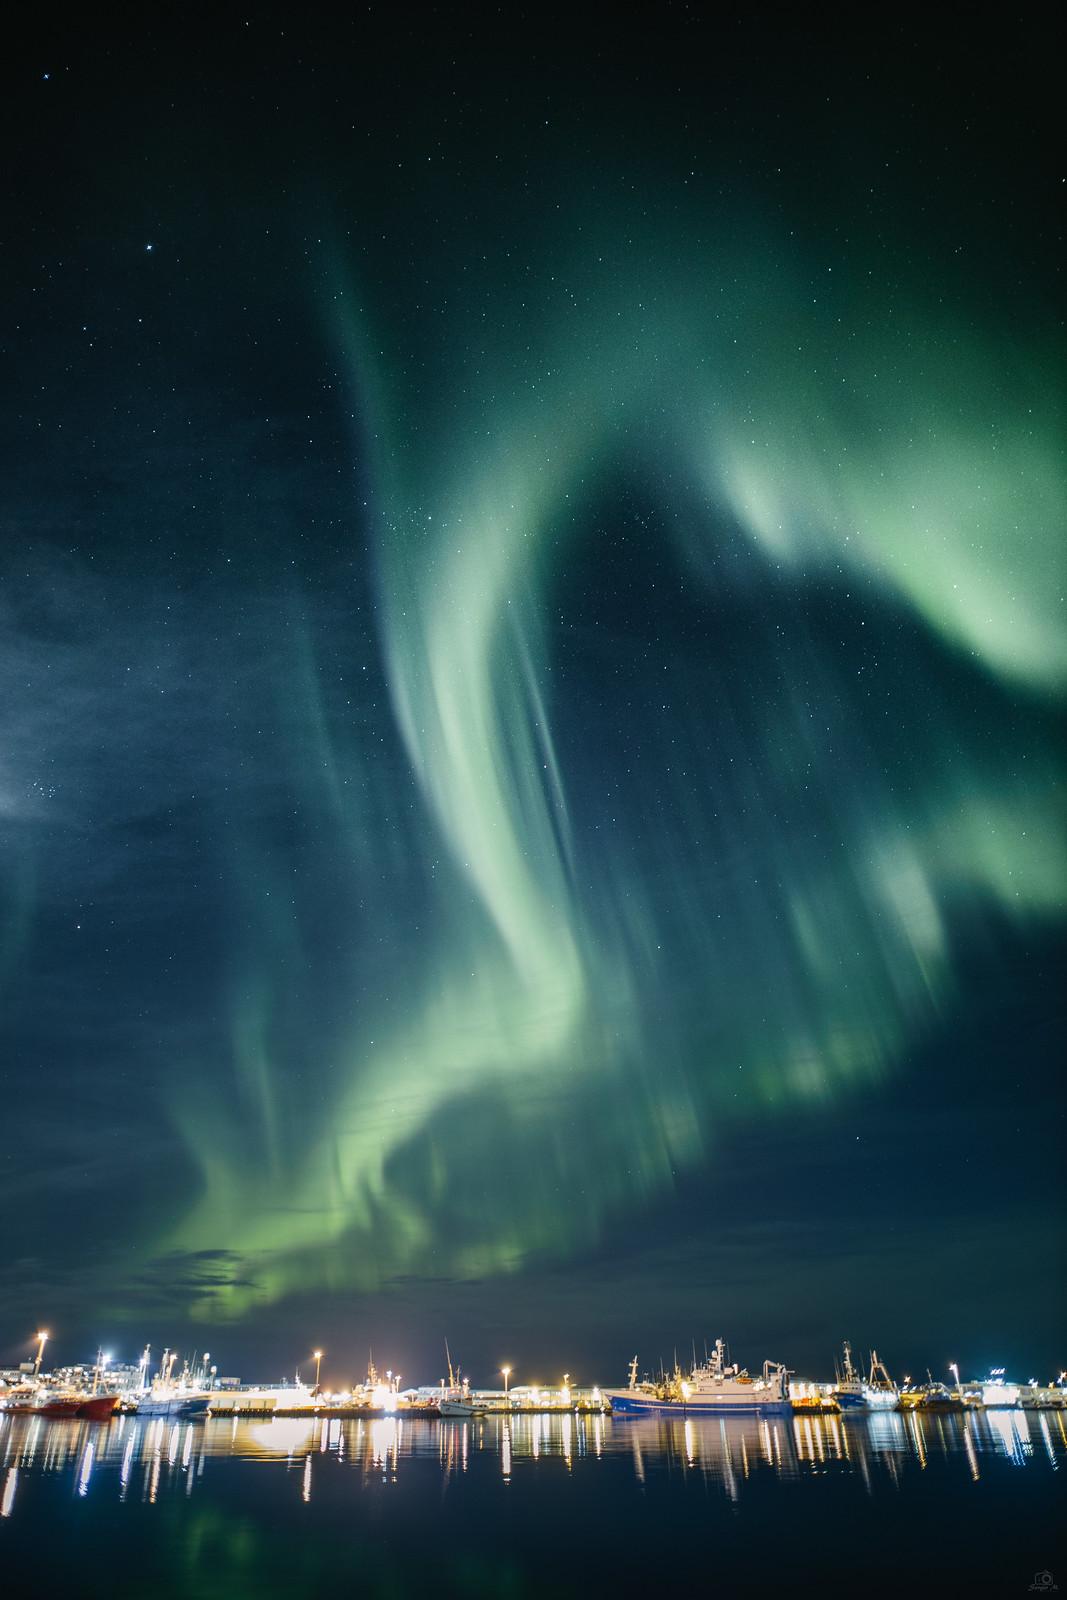 Northern Lights (Aurora Borealis) - Reykjavik Harbour